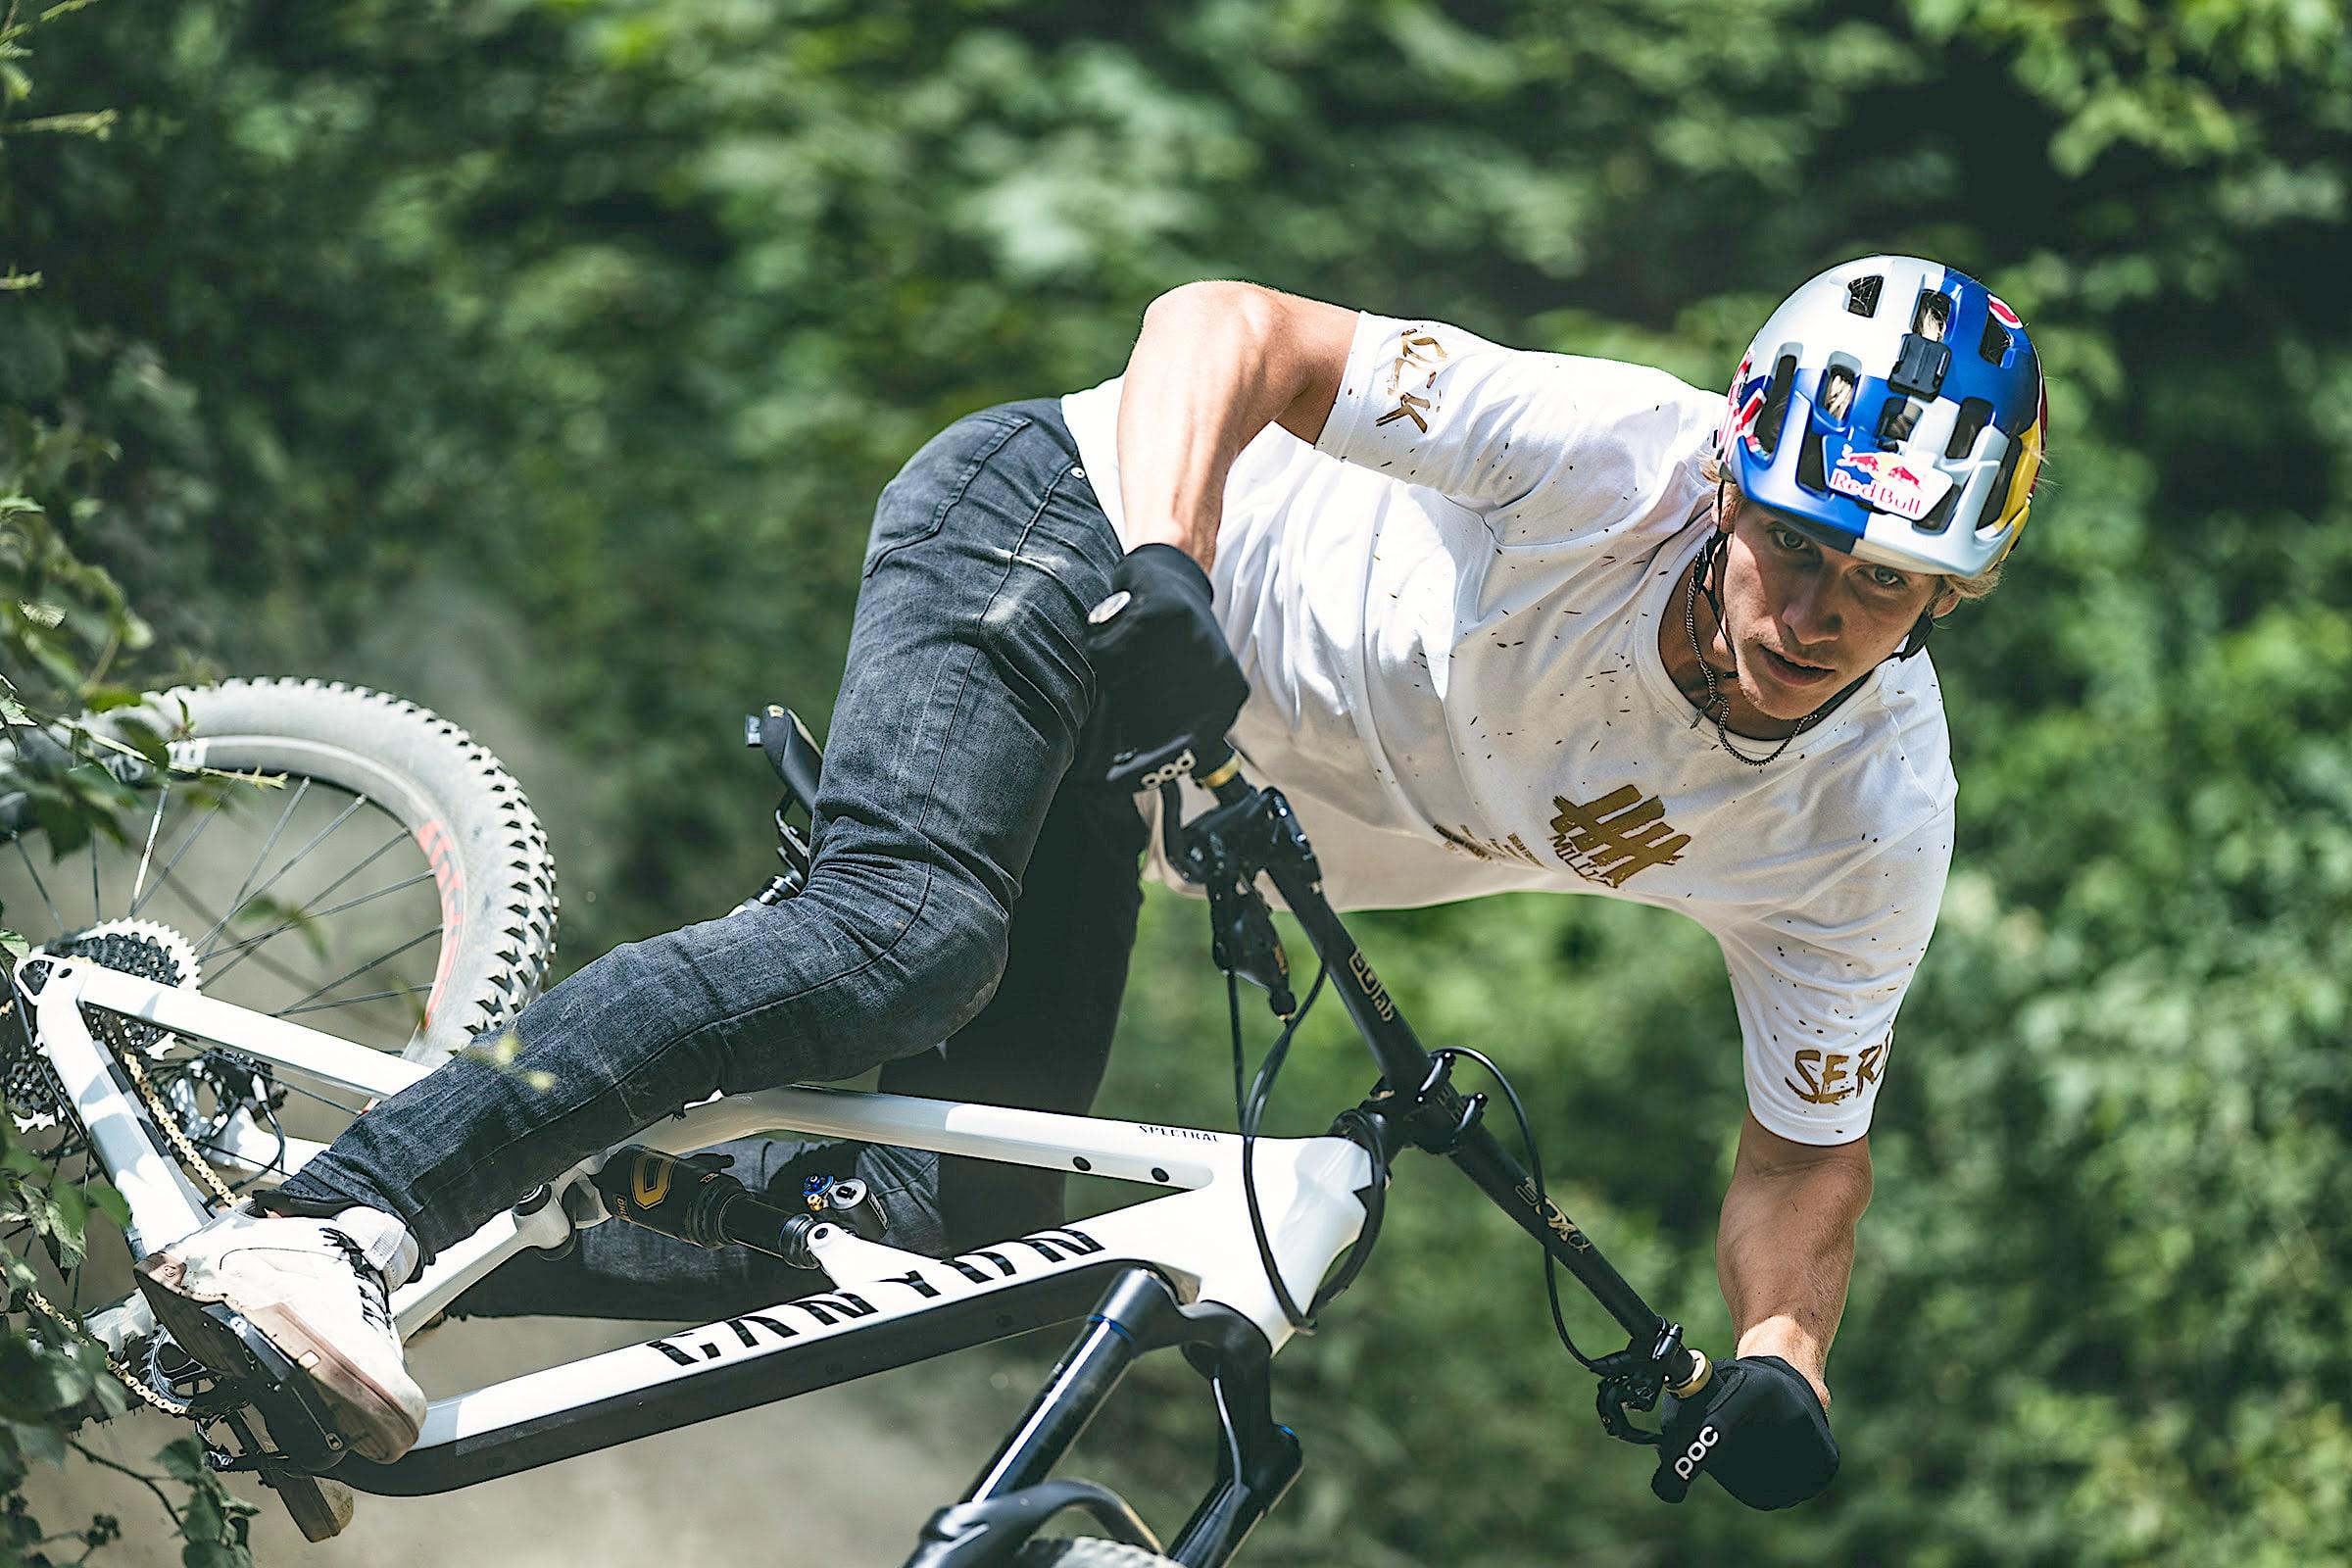 Fabio Wibmer's New Magura MT5 Limited Edition Brakes   Mountain Bike Action Magazine